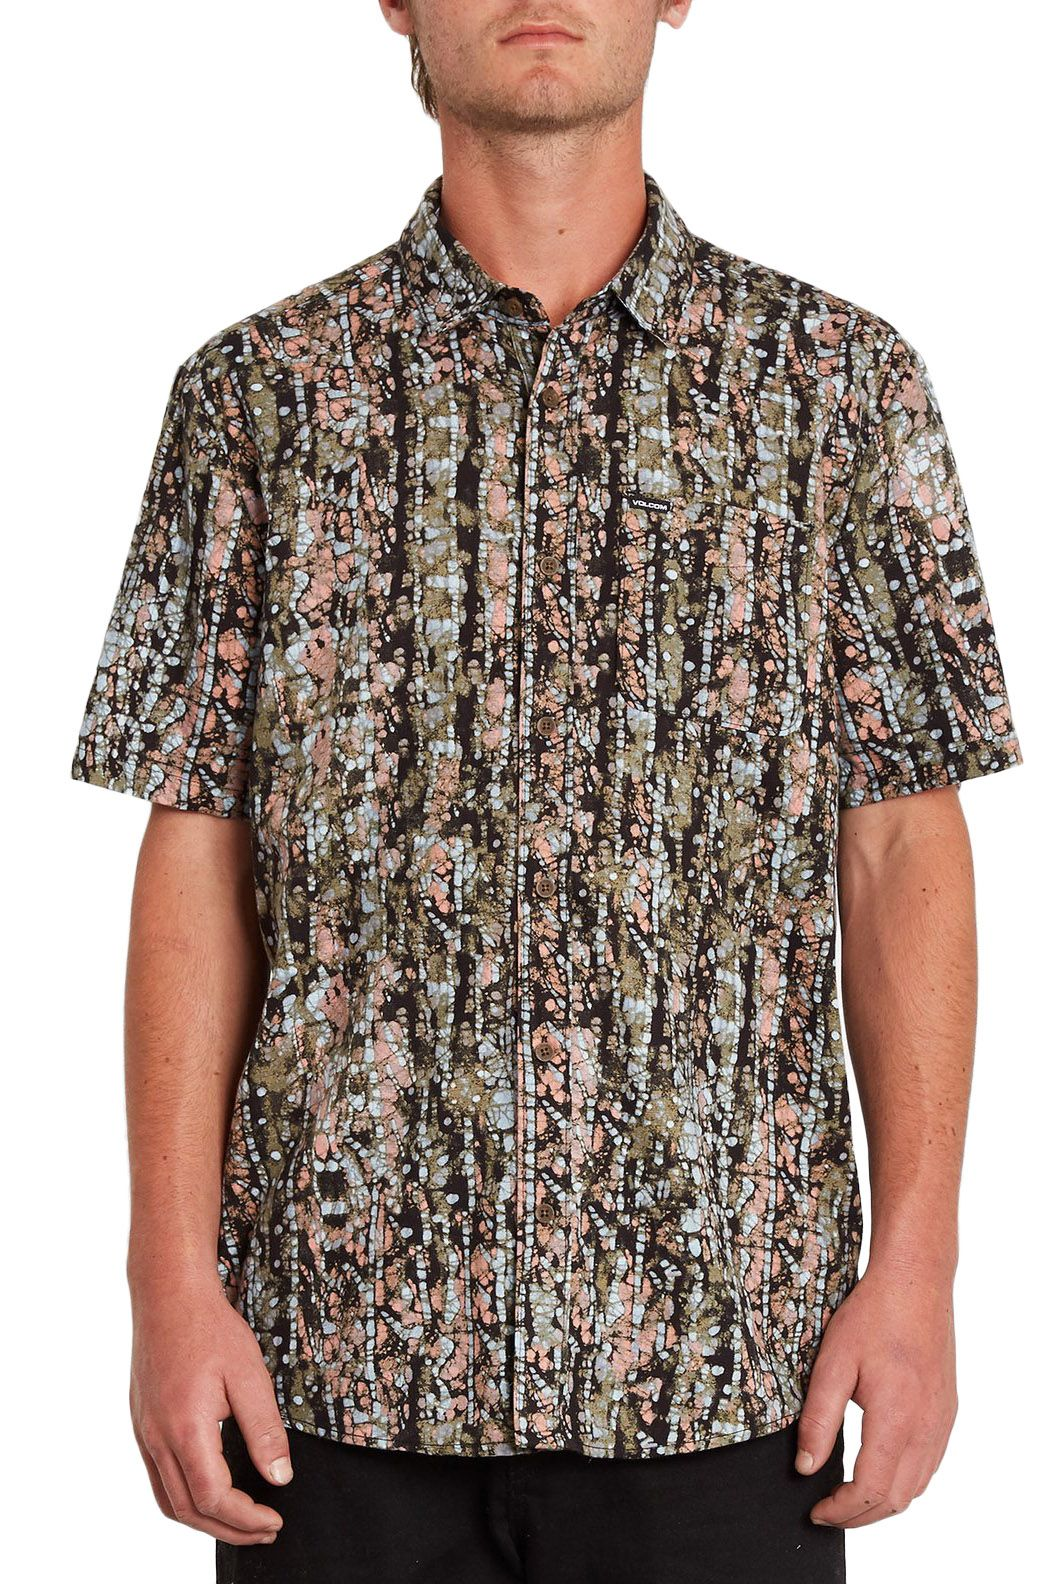 Volcom Shirt STRIVER S/S Old Mill